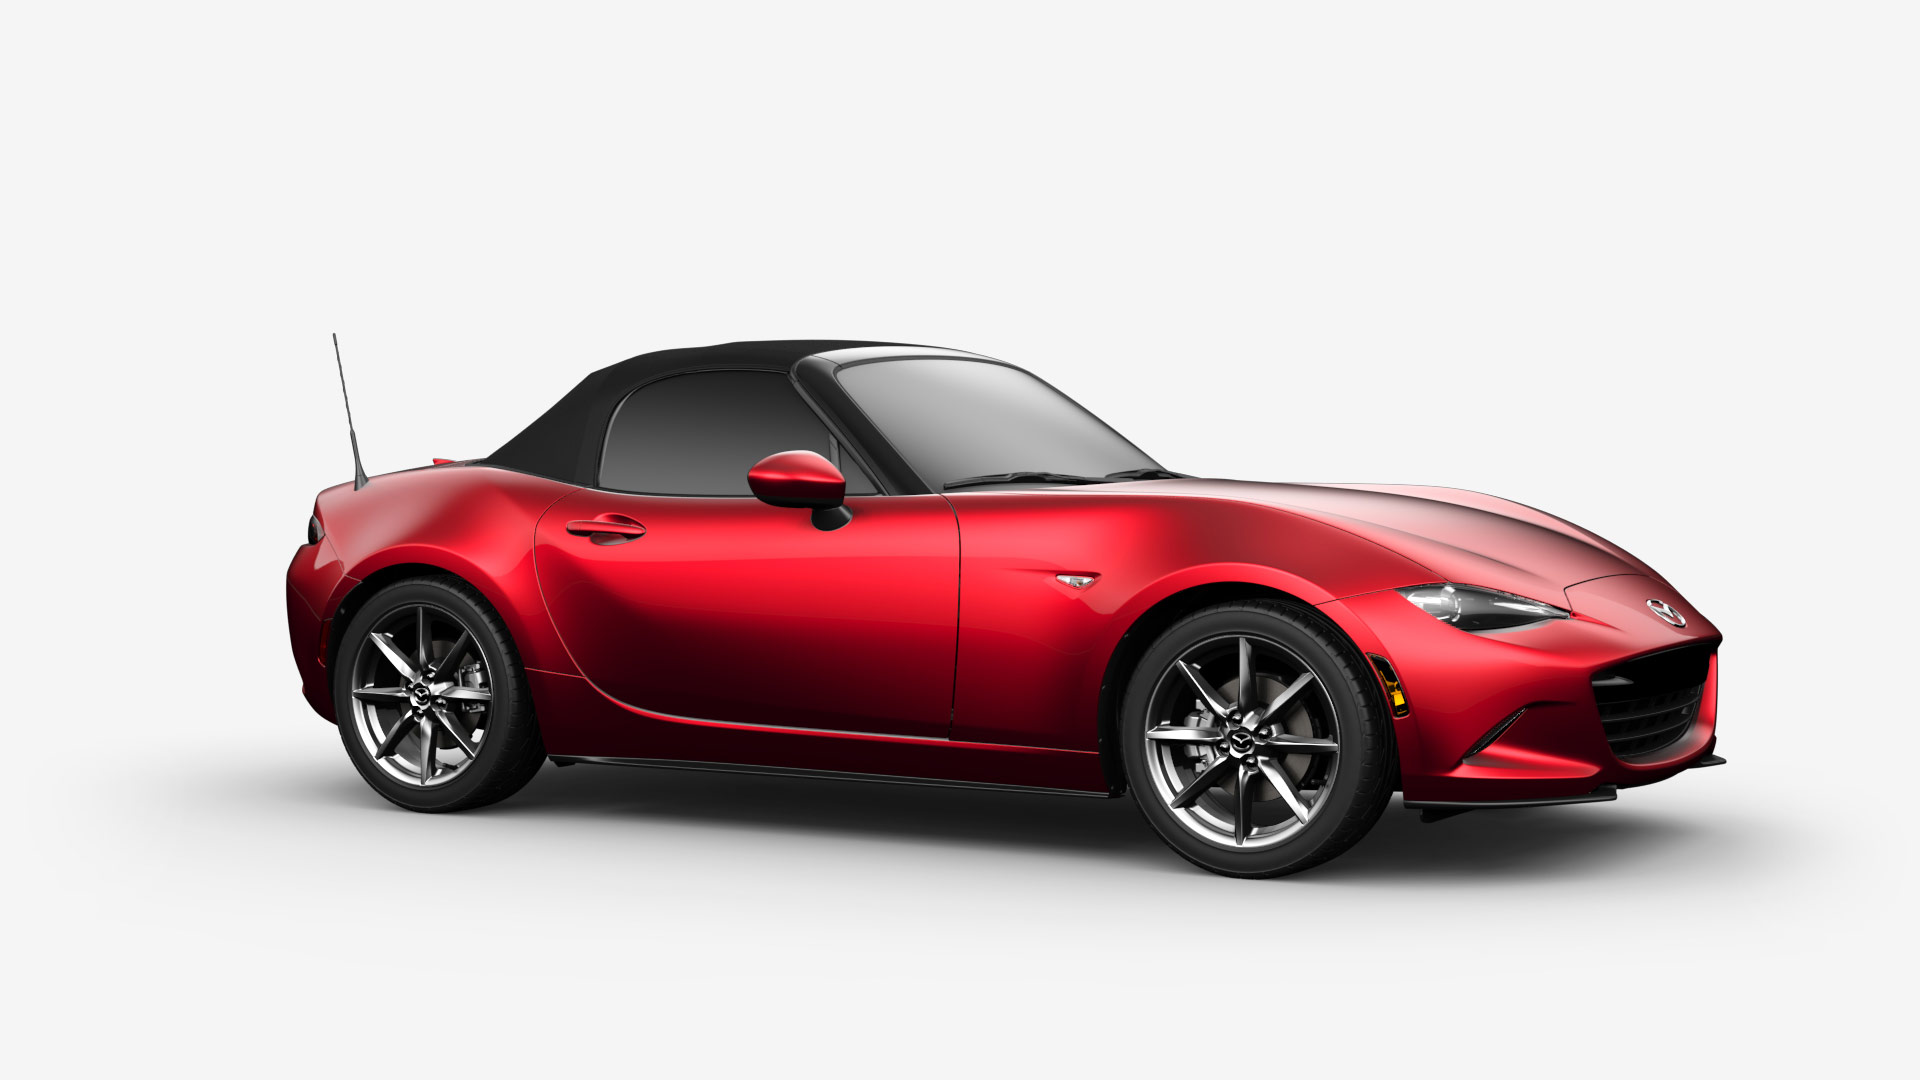 2018 Mazda MX 5 Miata Convertible Roadster | Mazda USA